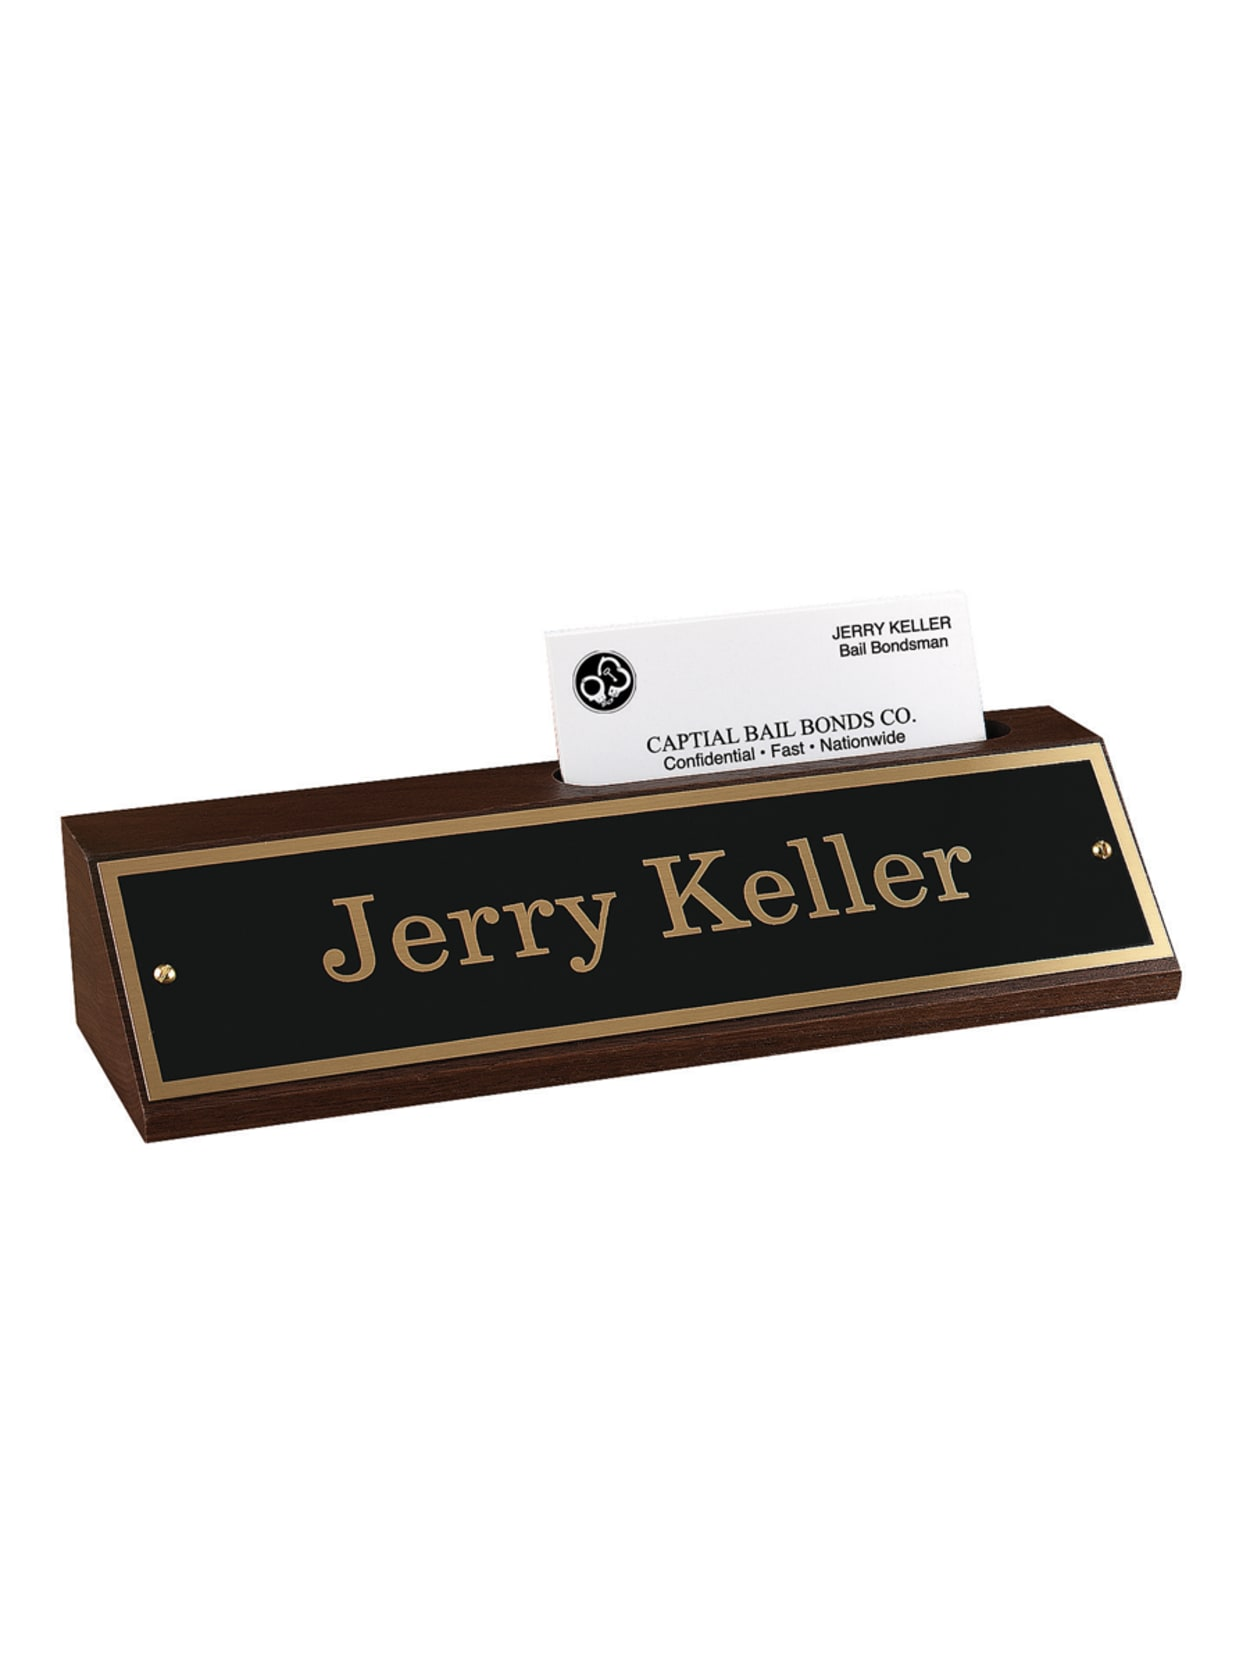 Custom Engraved Black And Gold Metal Desk Sign With Walnut Desk Bar And Business Card Holder 1 34 X 8 12 Office Depot